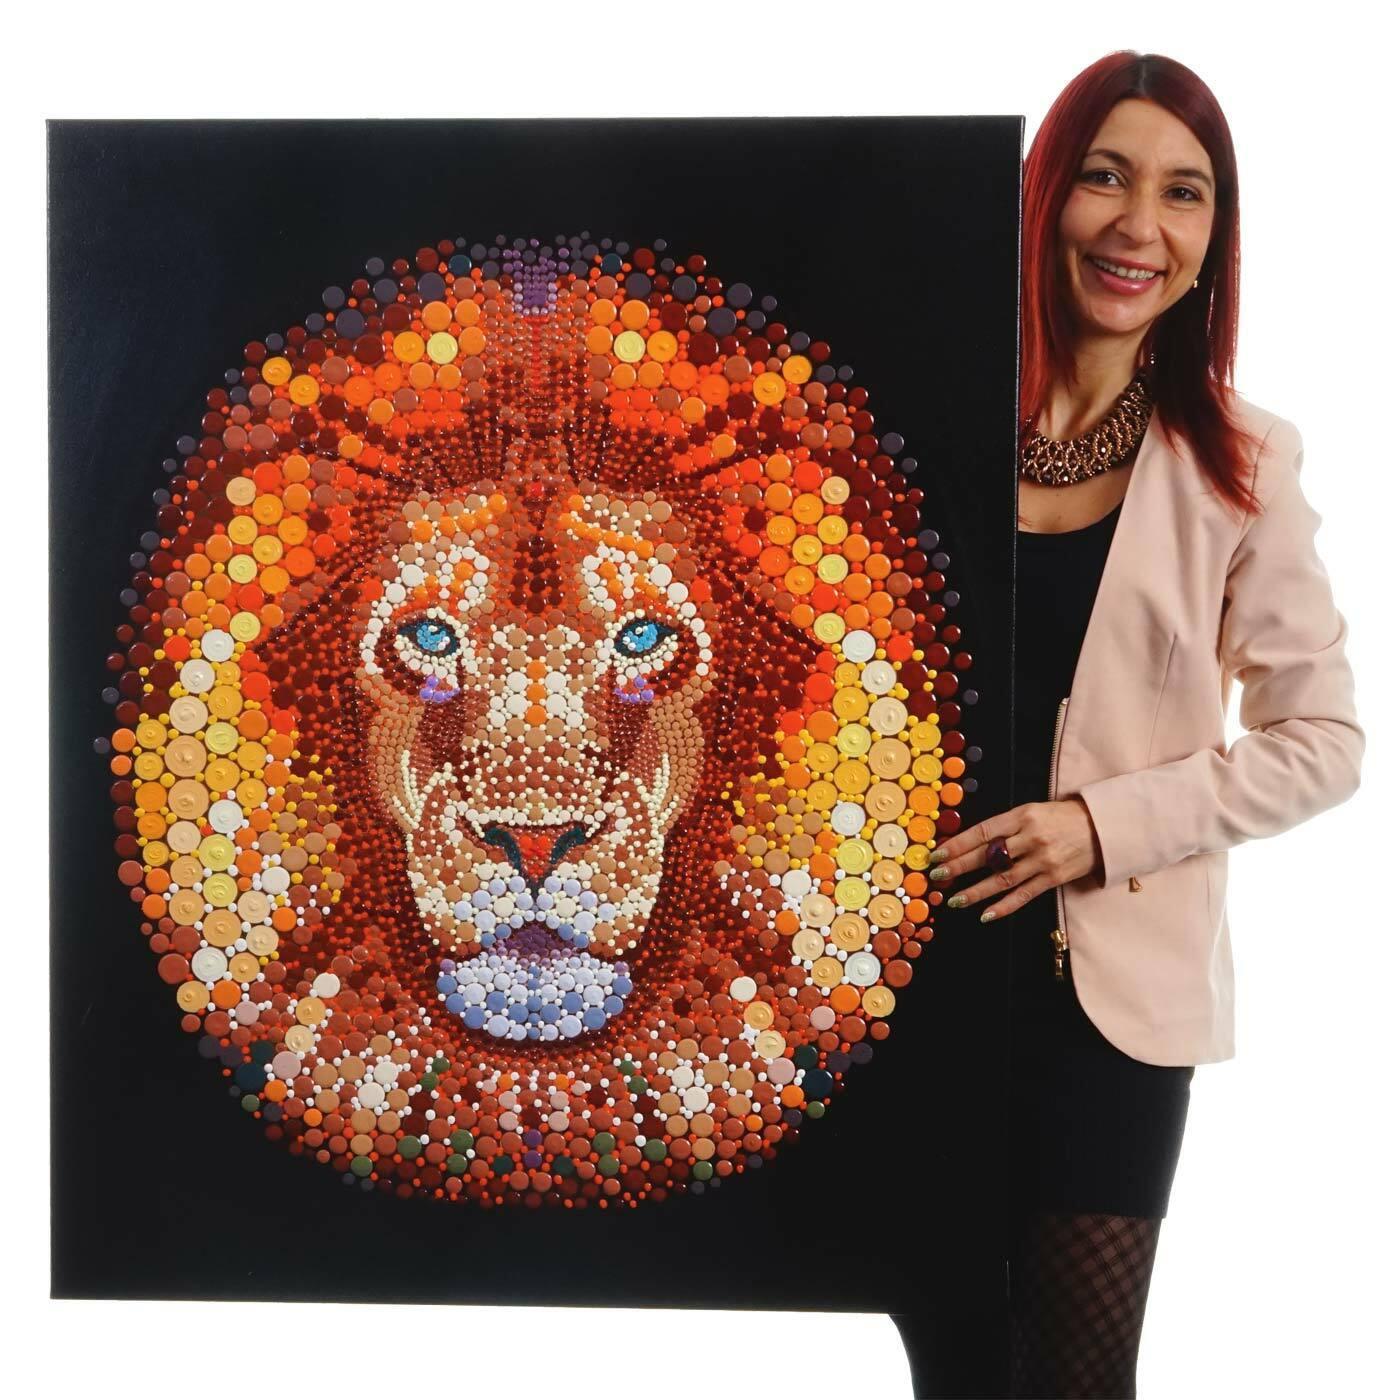 Ölgemälde Löwe, 100x80cm, 100% handgemaltes Wandbild Gemälde XL